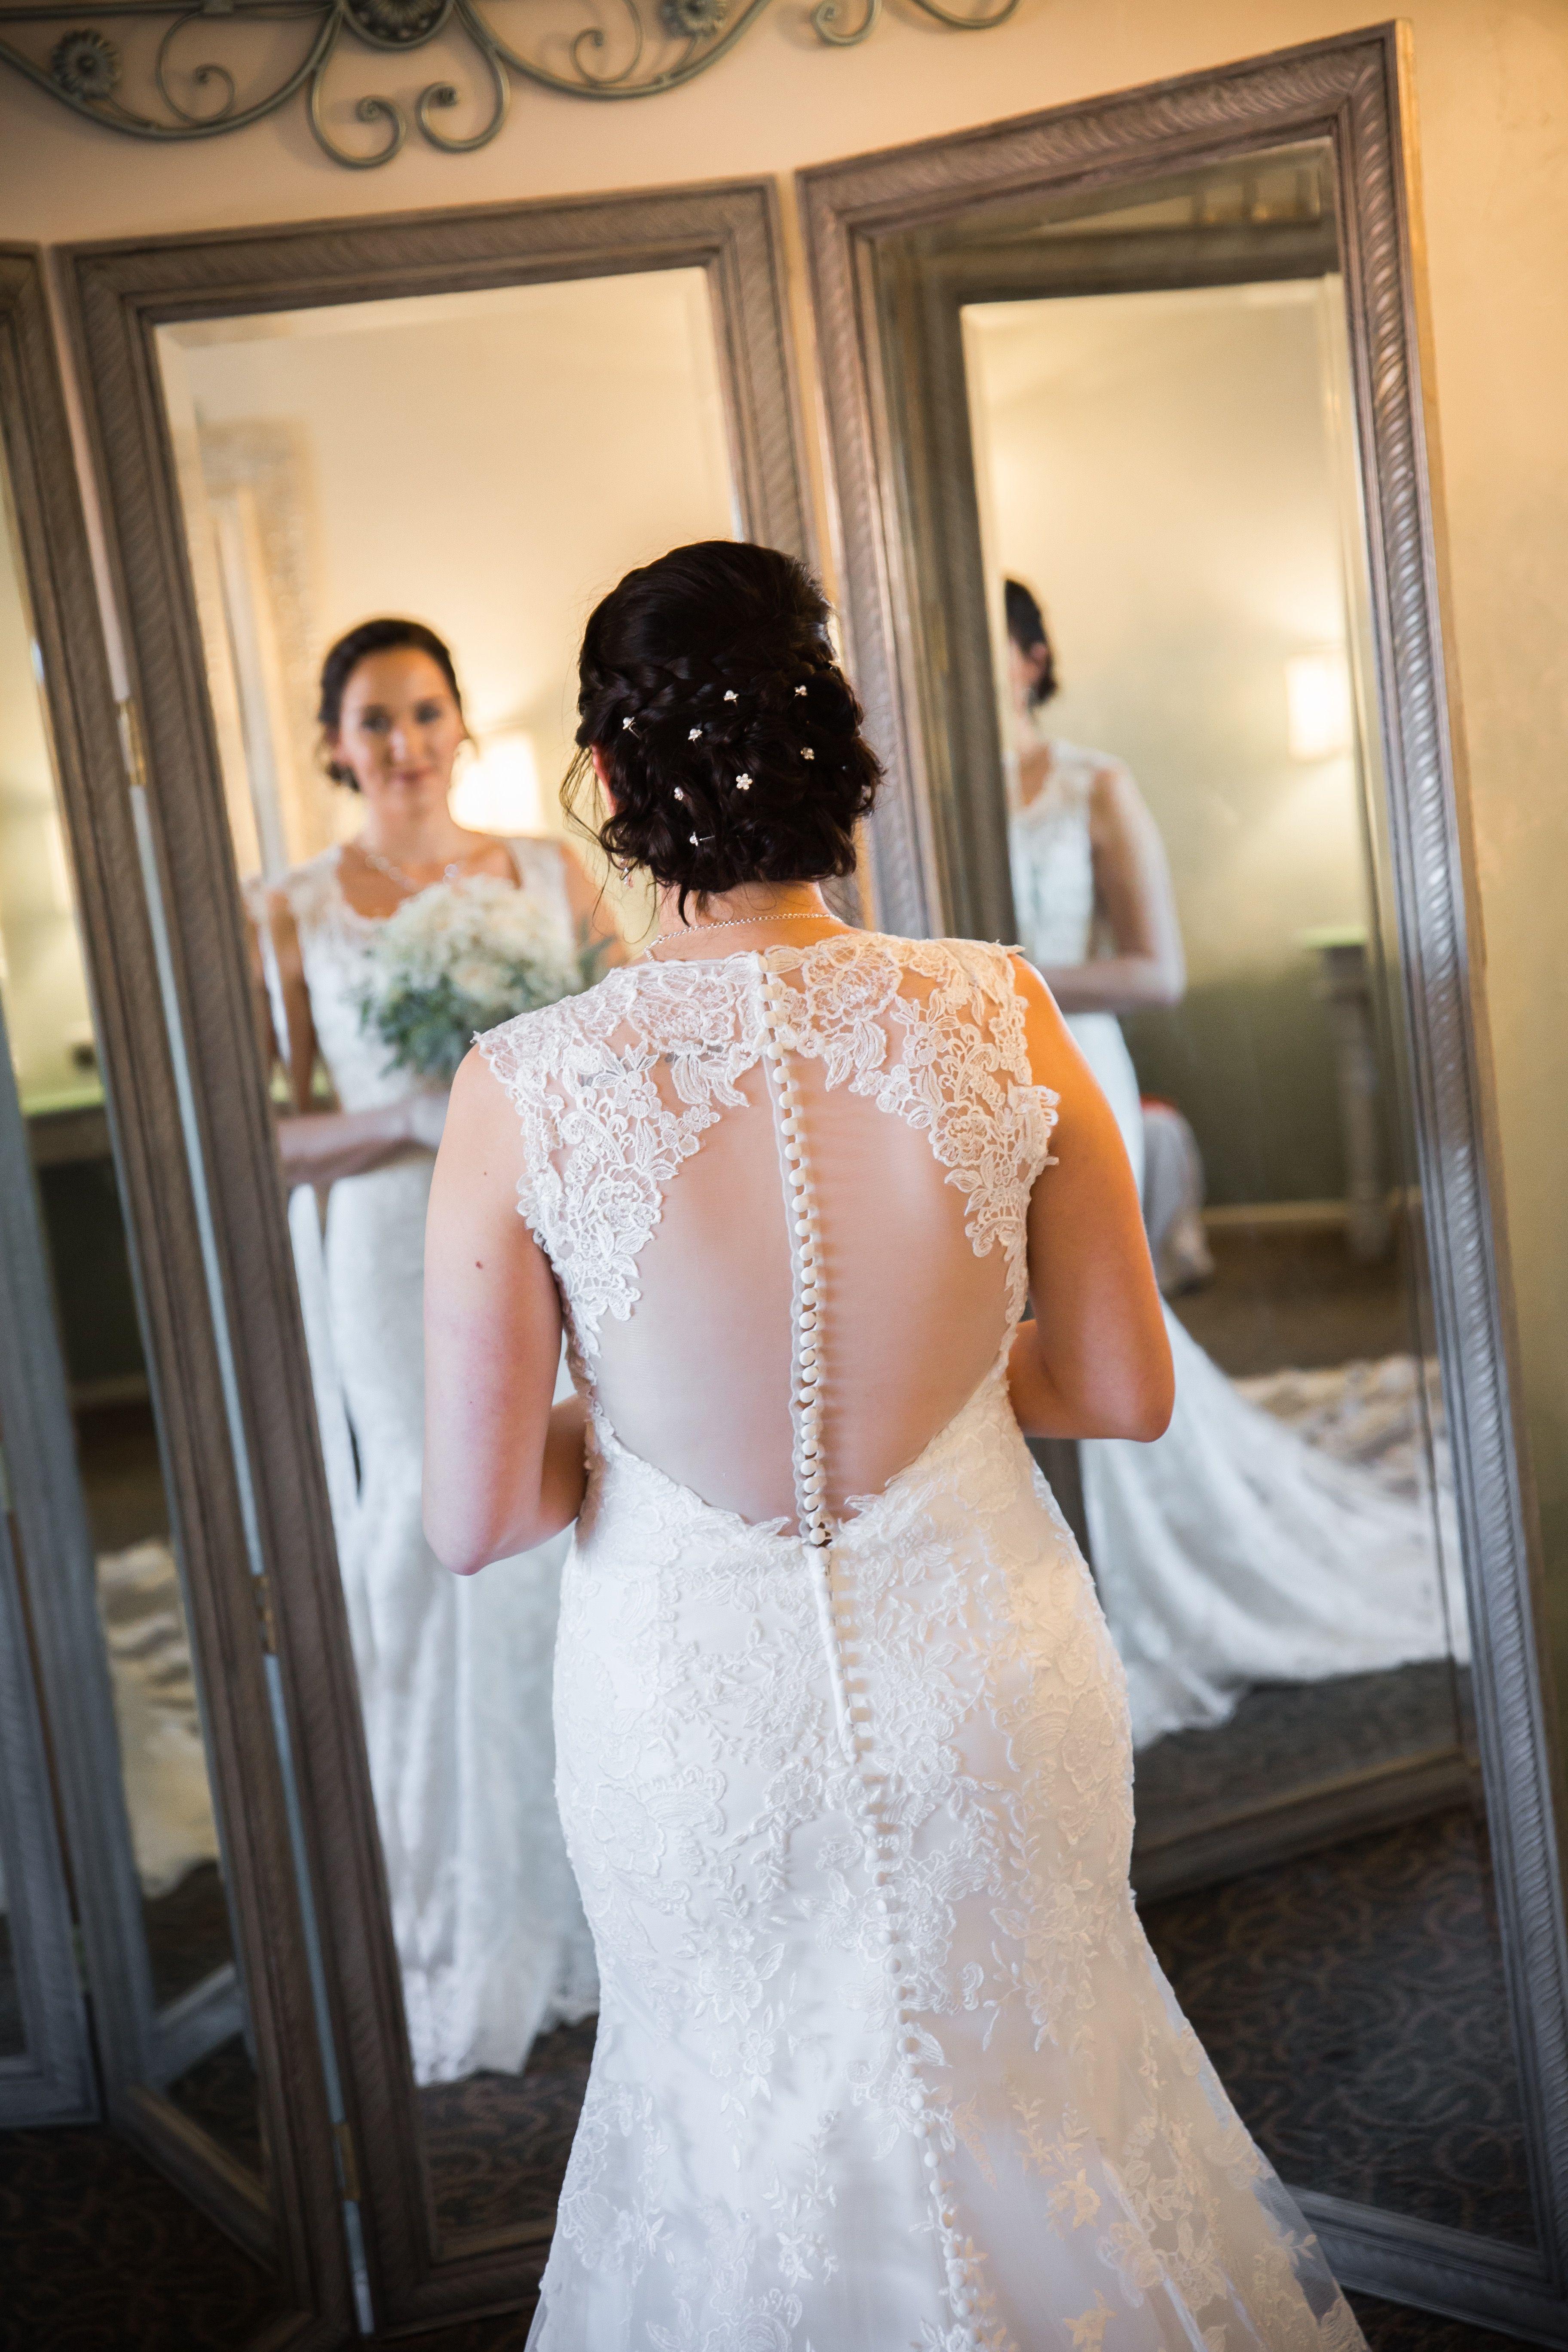 Wedding Pictures / Photography at La Mariposa Resort  in Tucson Arizona http://www.lamariposaresort.com/ 1501 N Houghton Rd, Tucson, AZ 85749 By JW Photography Tucson Az www.jwphotographytucson.com